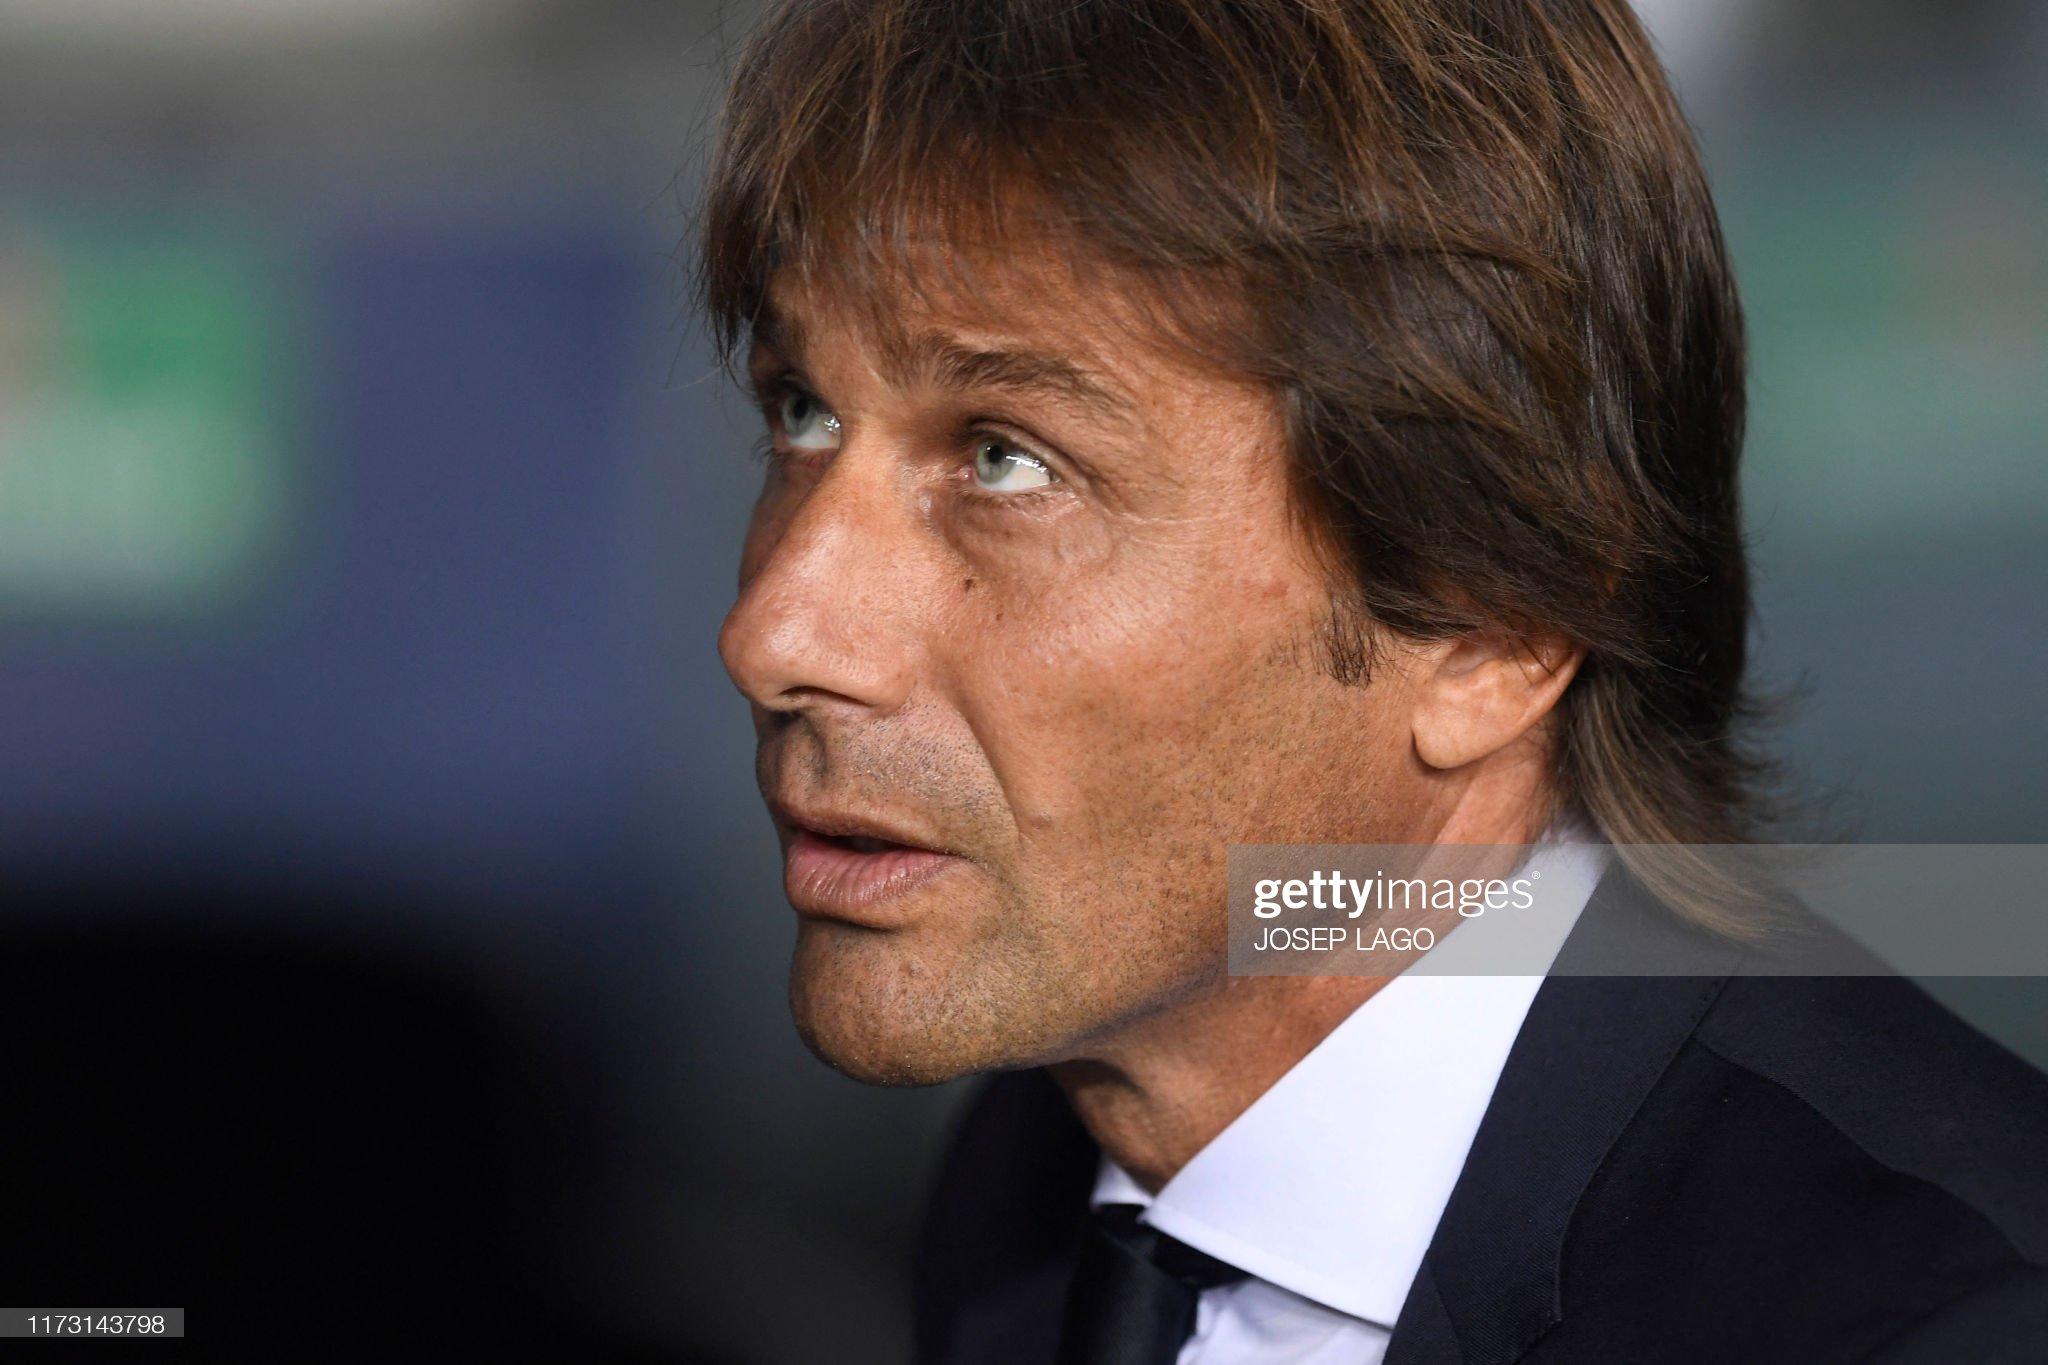 صور مباراة : برشلونة - إنتر 2-1 ( 02-10-2019 )  Inter-milans-italian-coach-antonio-conte-looks-on-before-the-uefa-picture-id1173143798?s=2048x2048